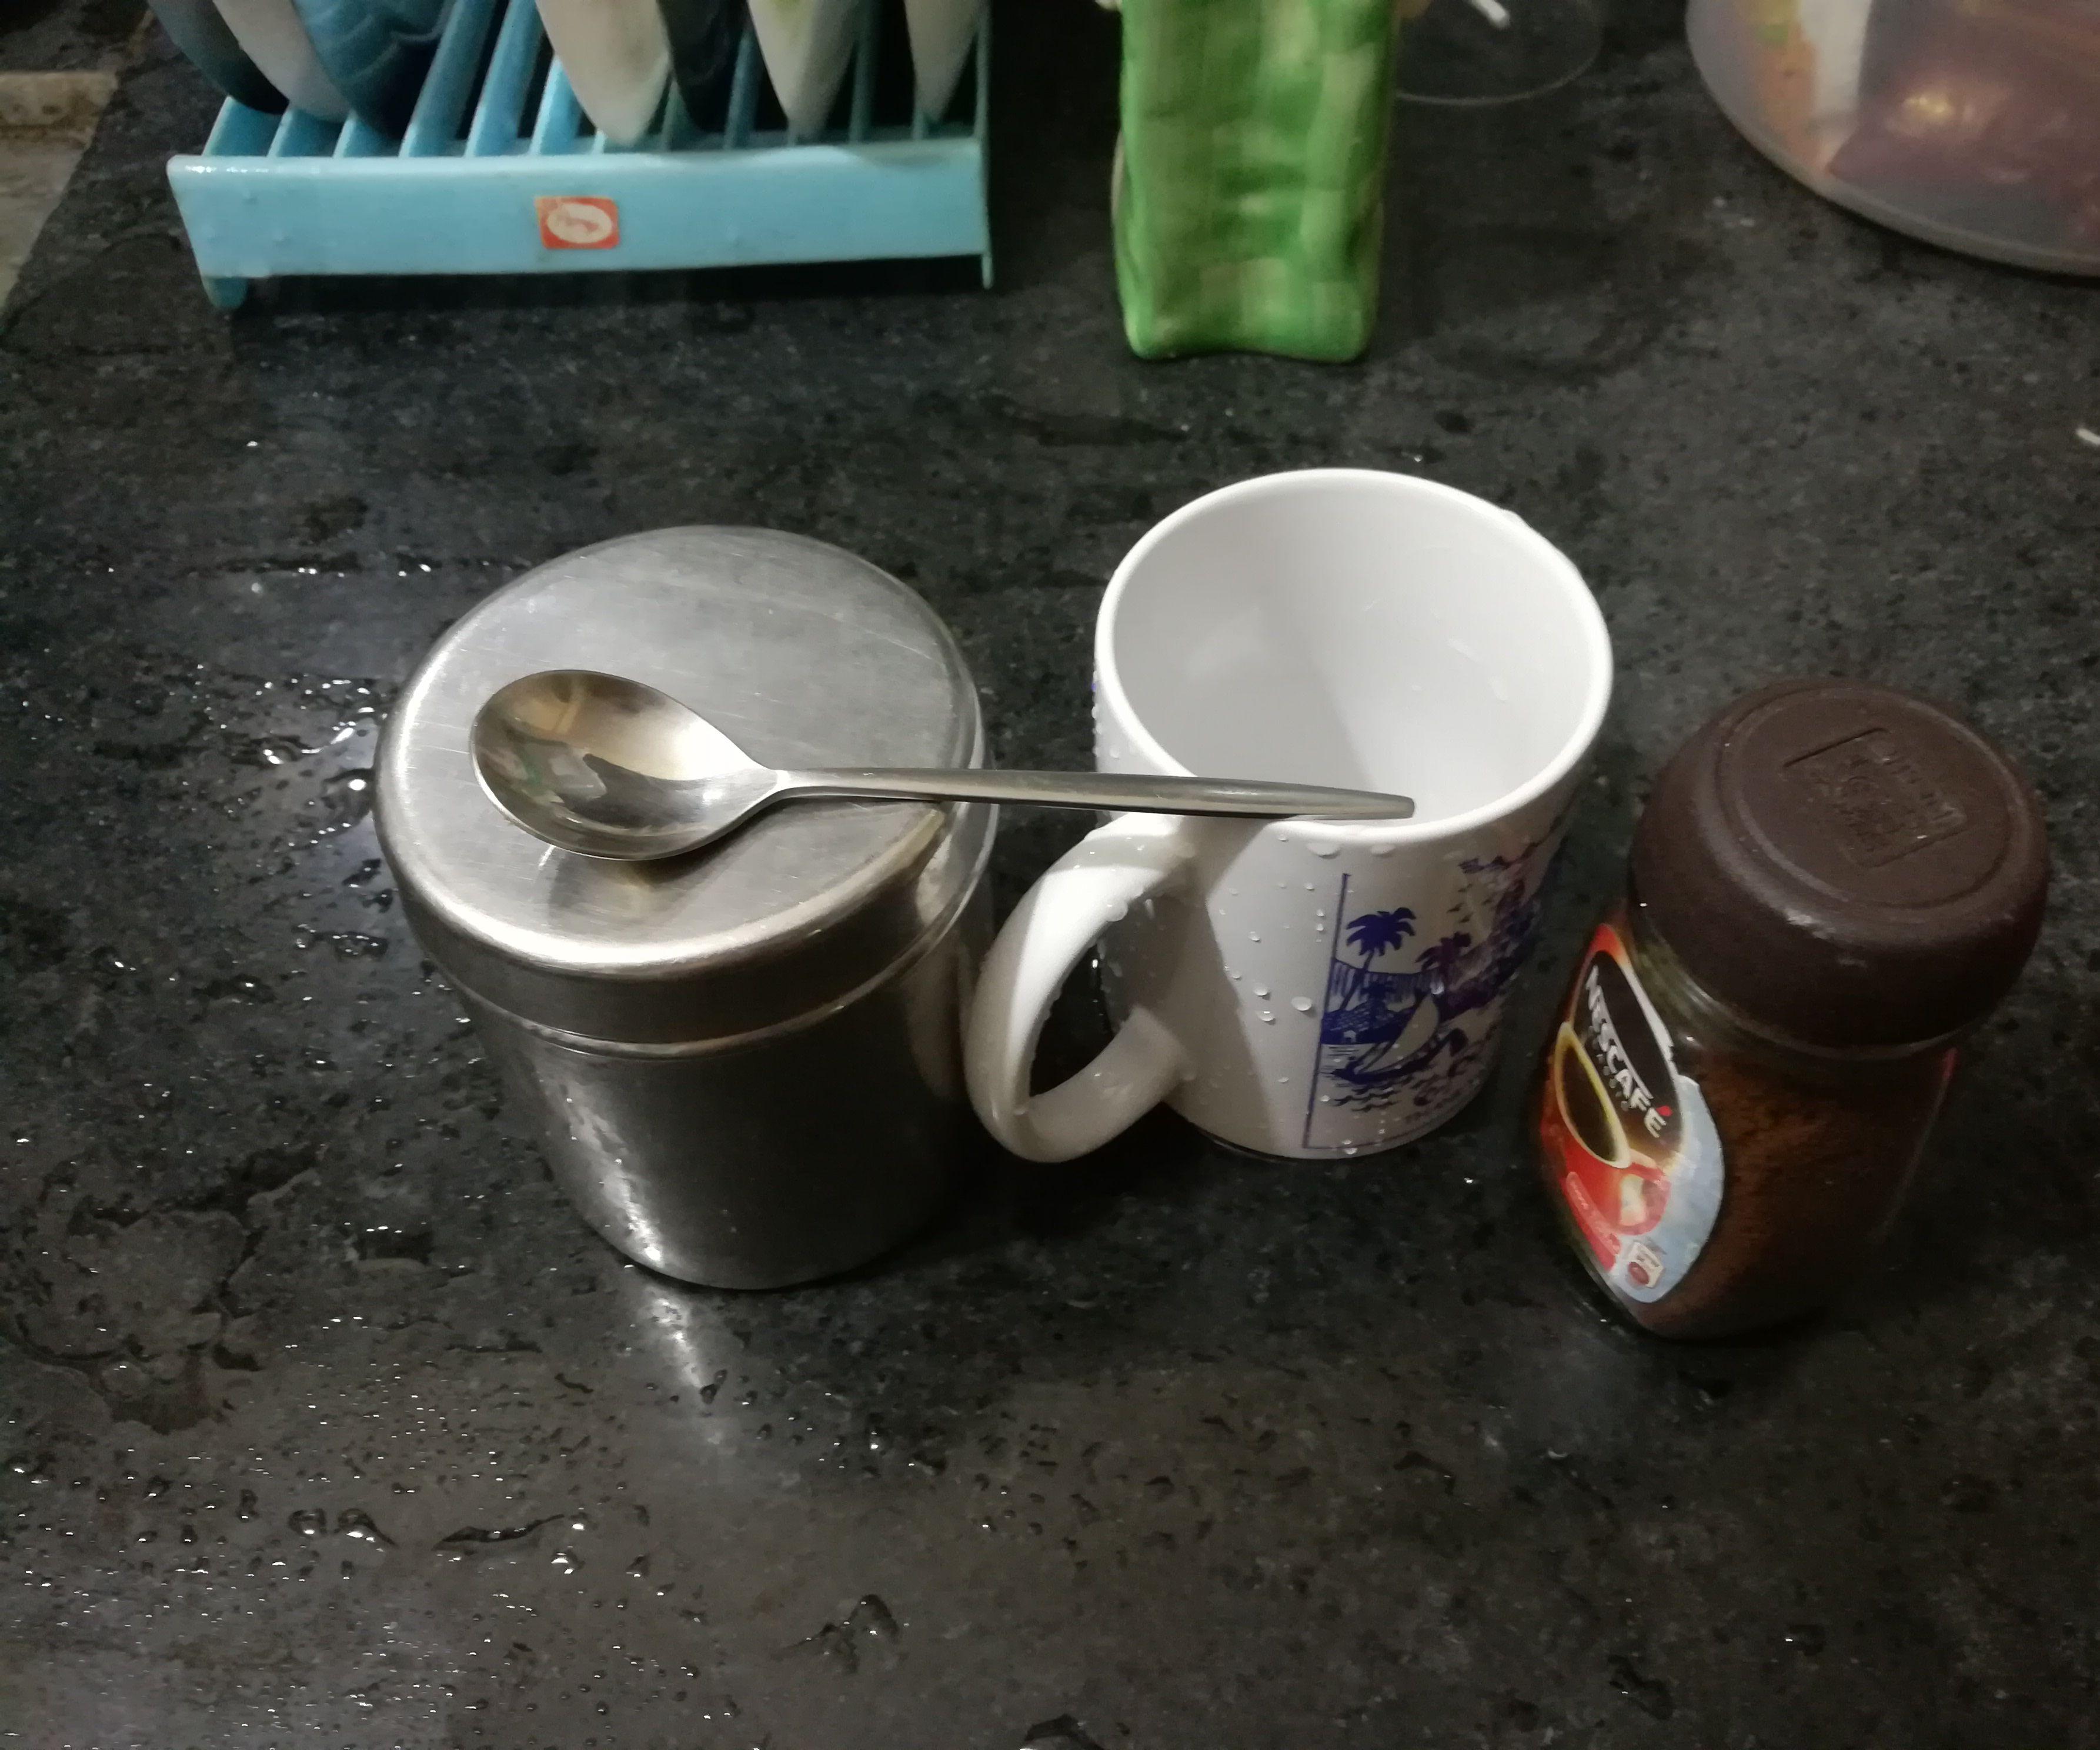 Instant Beaten Coffee With Nescafe